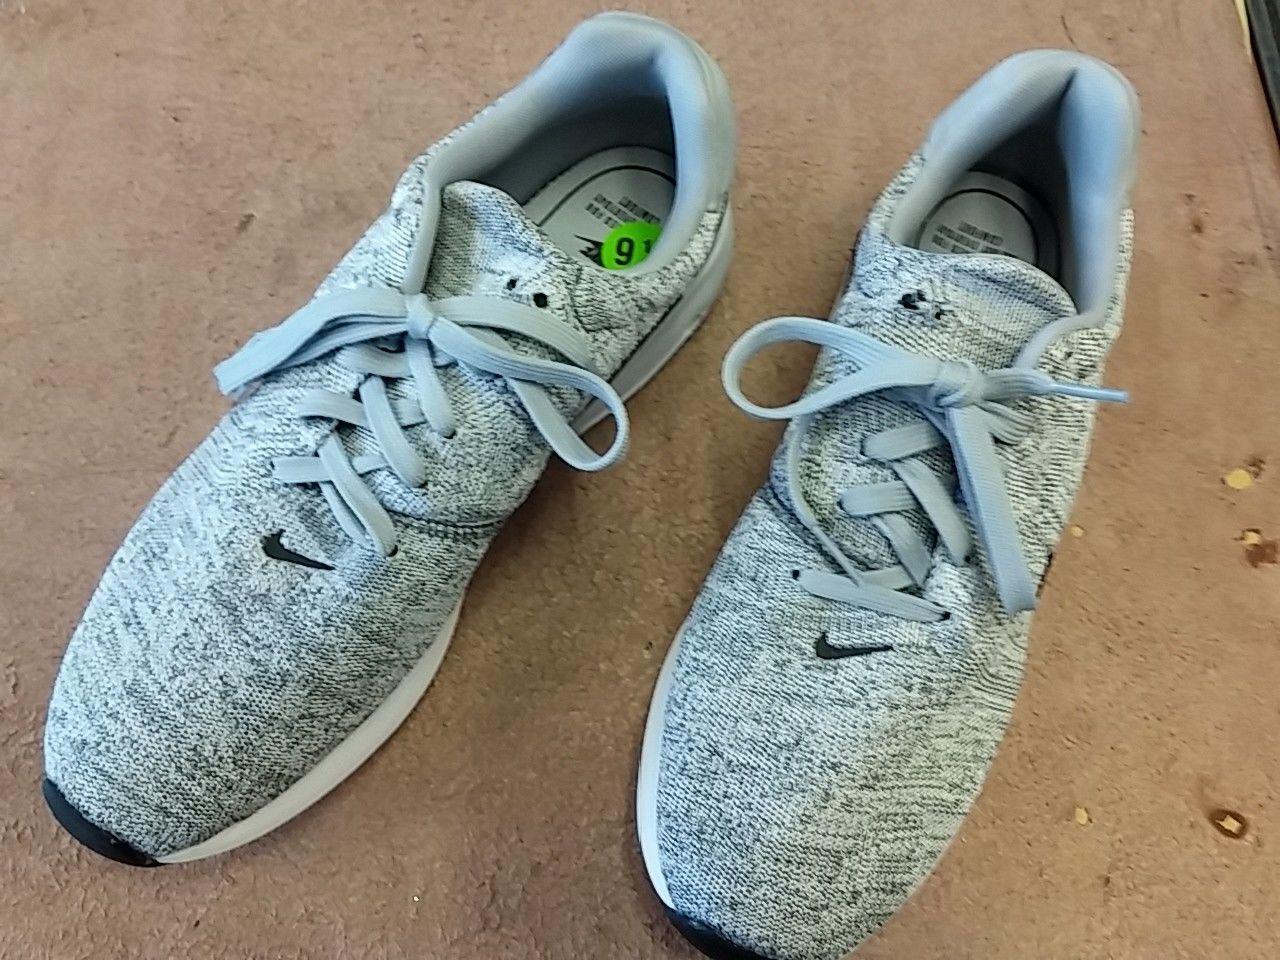 Nike air max moderne laufschuhe flyknit mens laufschuhe moderne 9.5wolf grau 876066 001 frei schiff 944235